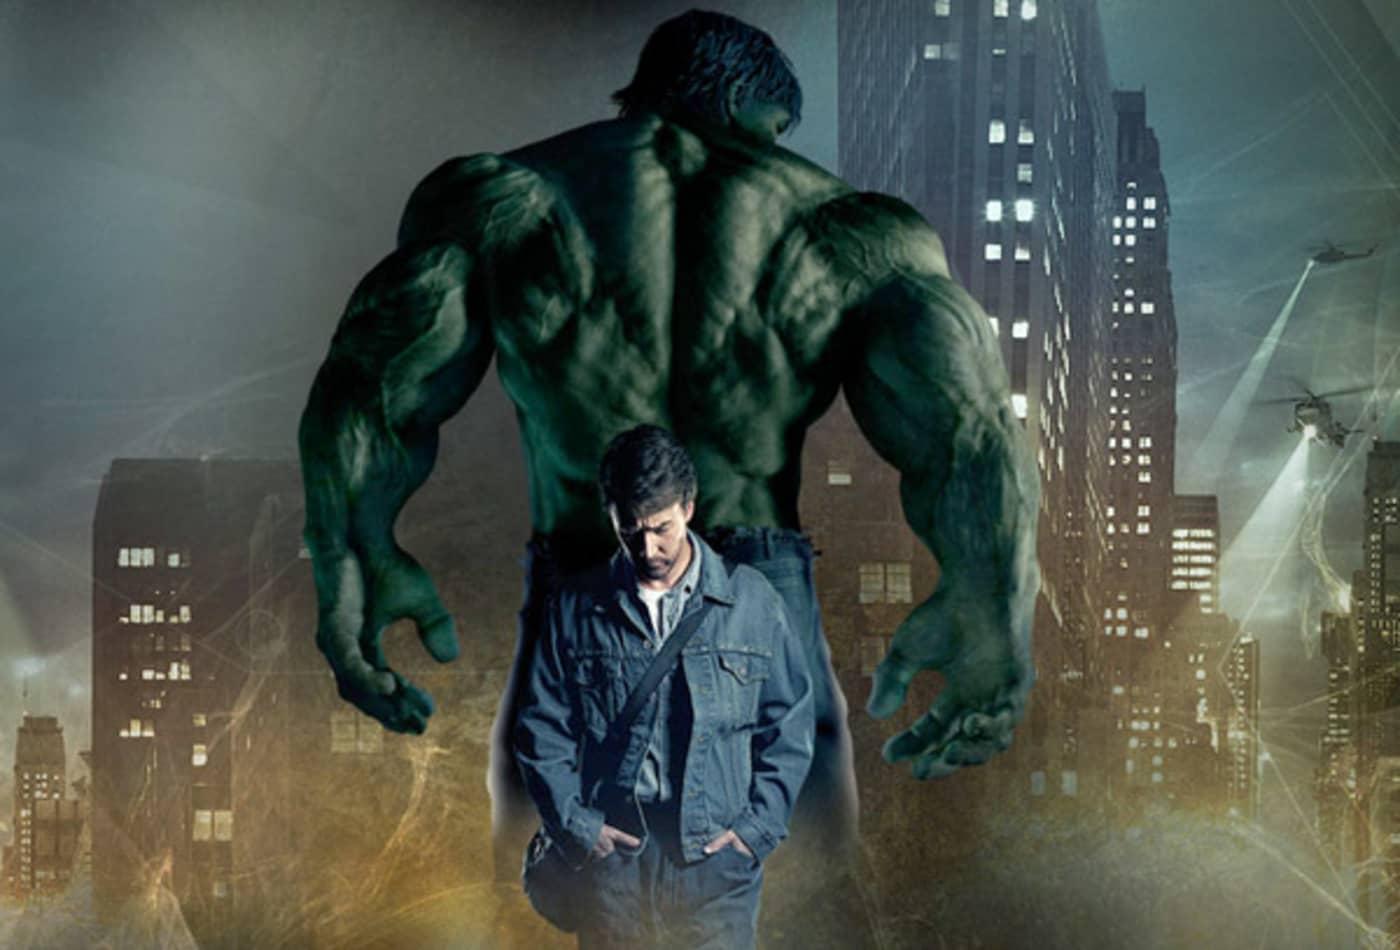 46955352 CNBC_superhero_films_2011_Hulk.jpg